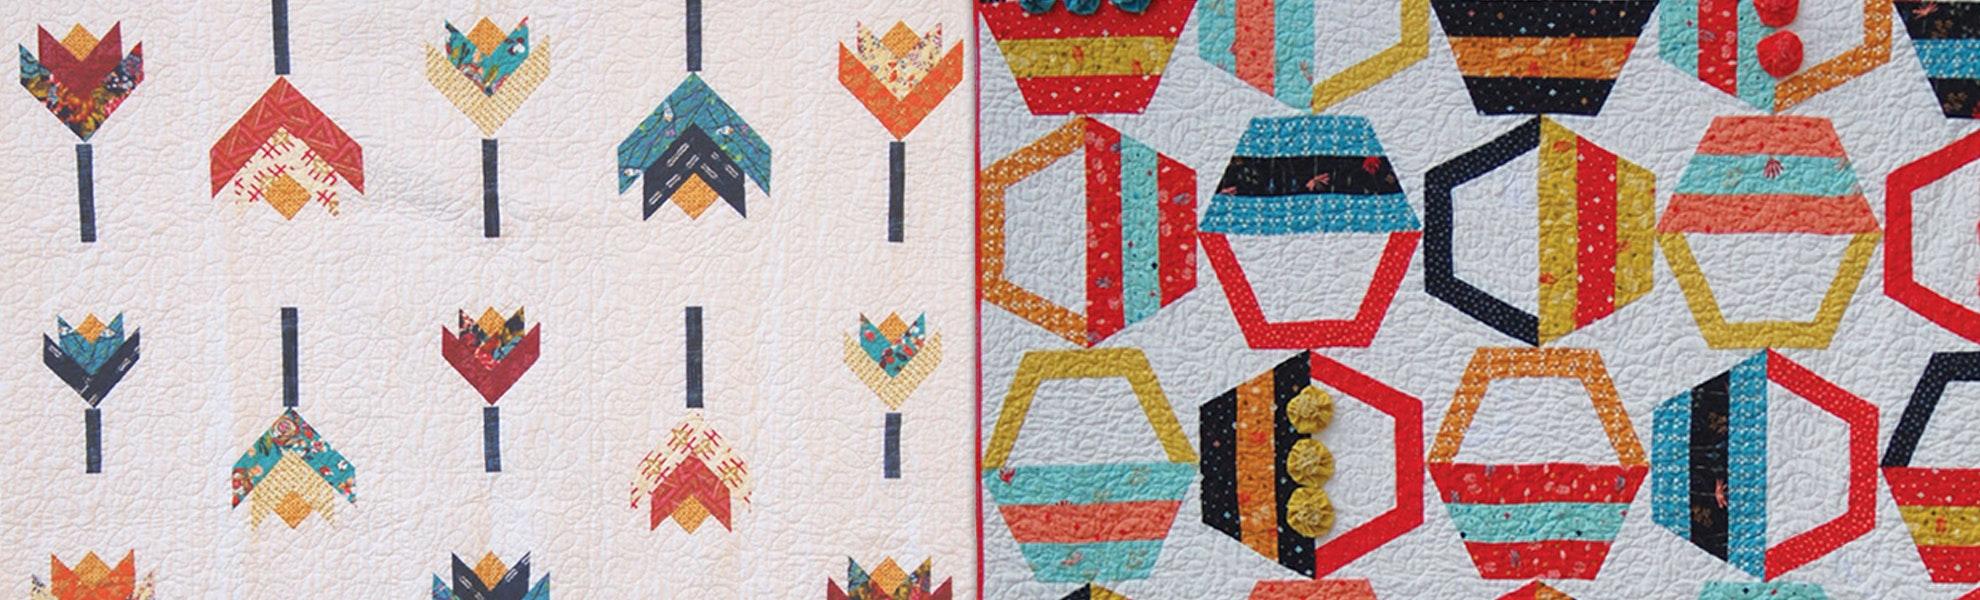 Abbey Lane Quilt Patterns